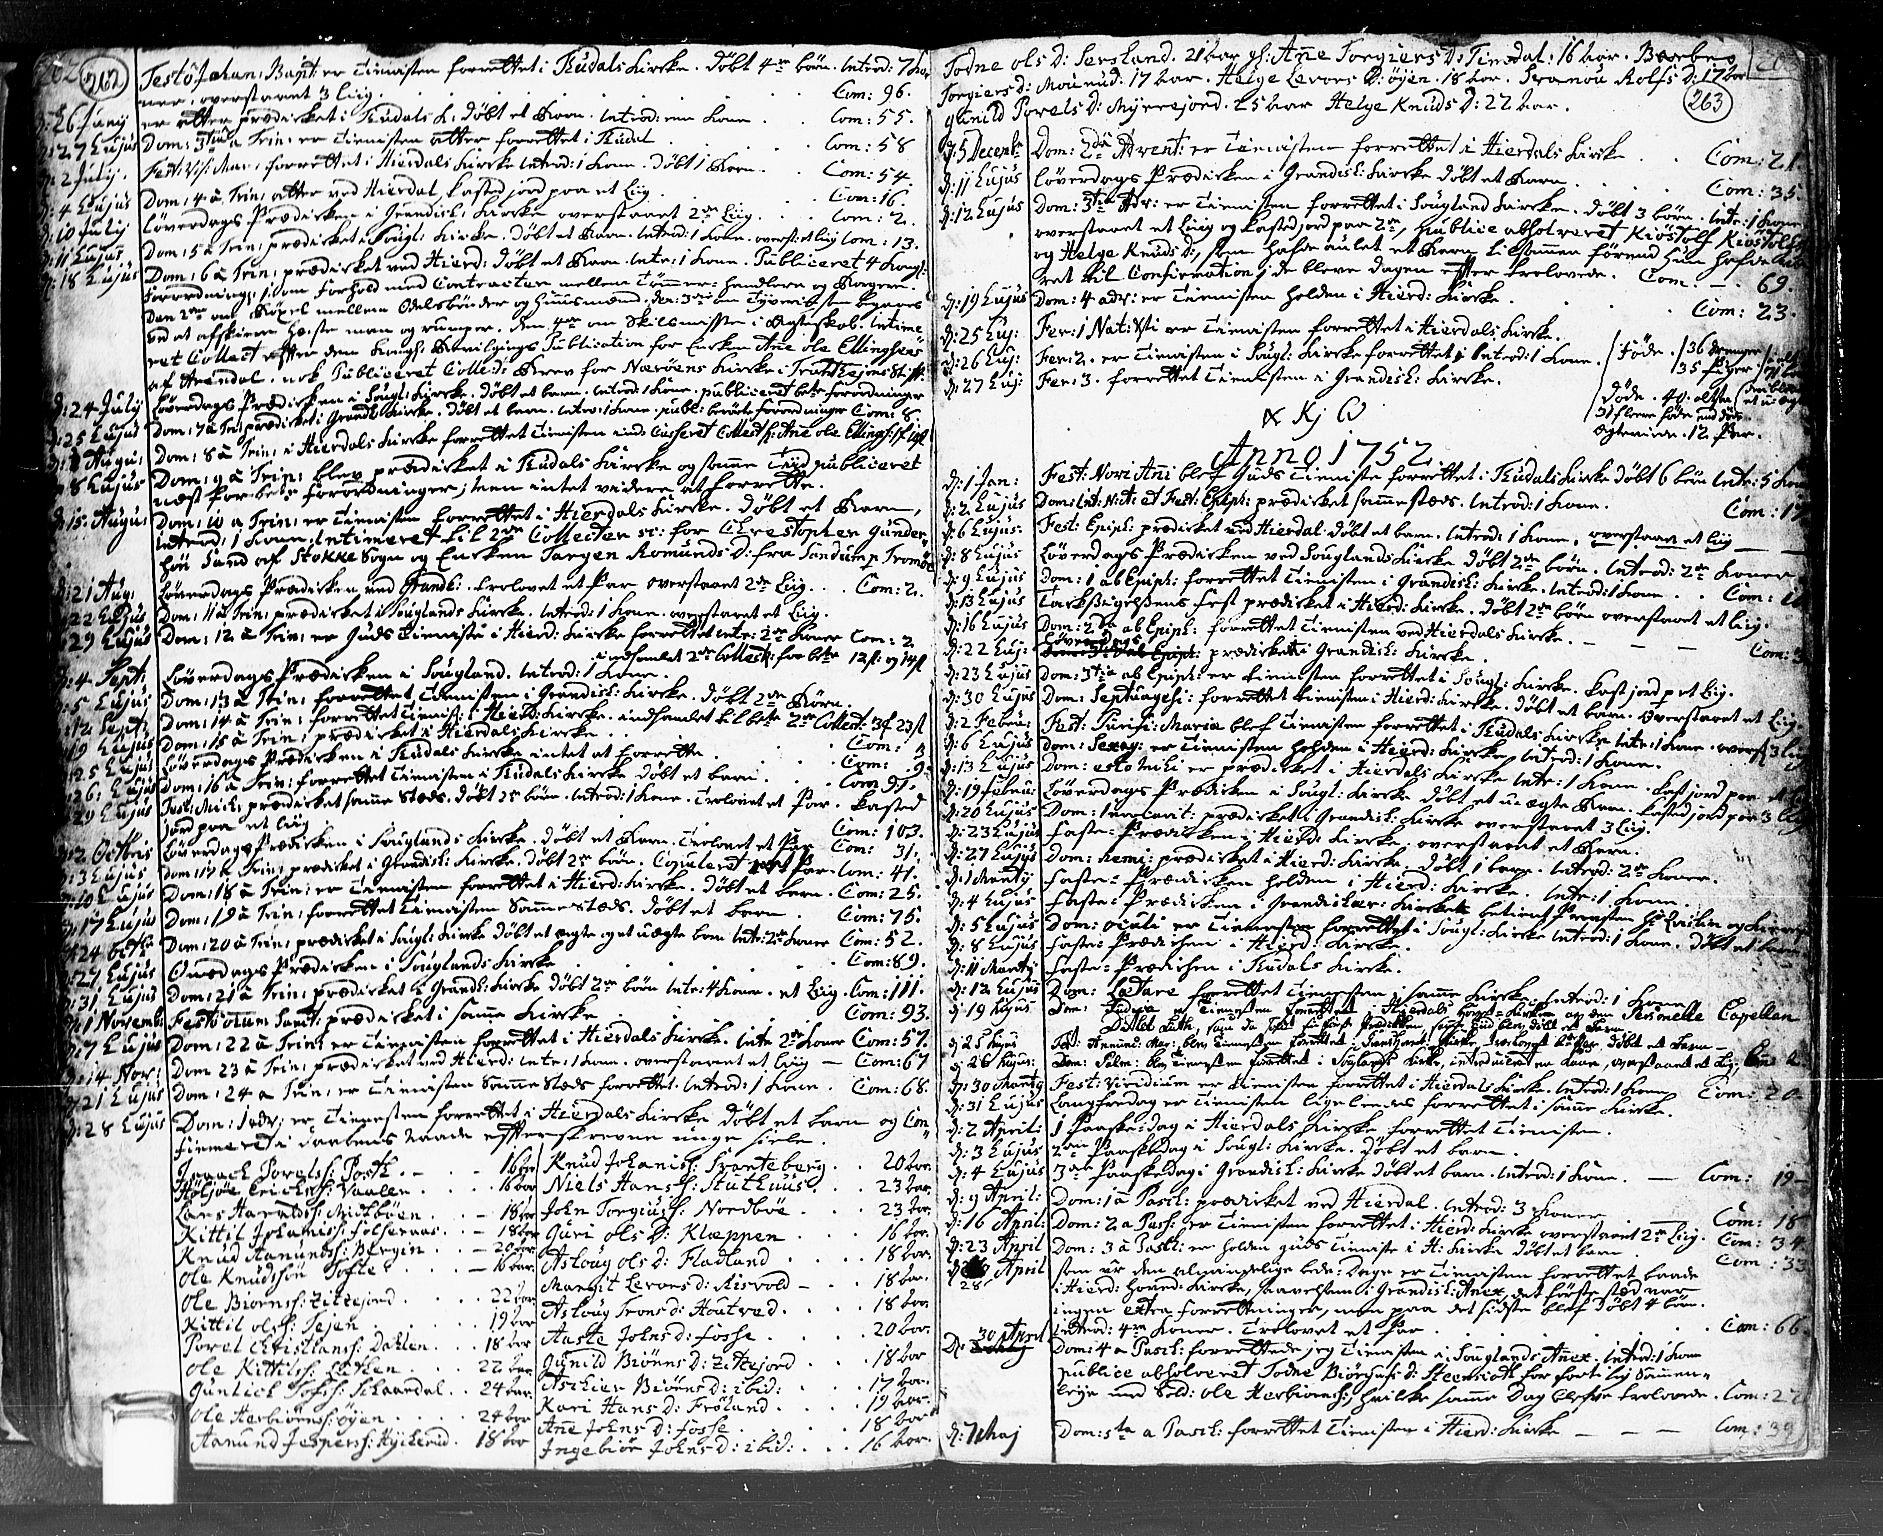 SAKO, Hjartdal kirkebøker, F/Fa/L0002: Ministerialbok nr. I 2, 1716-1754, s. 262-263